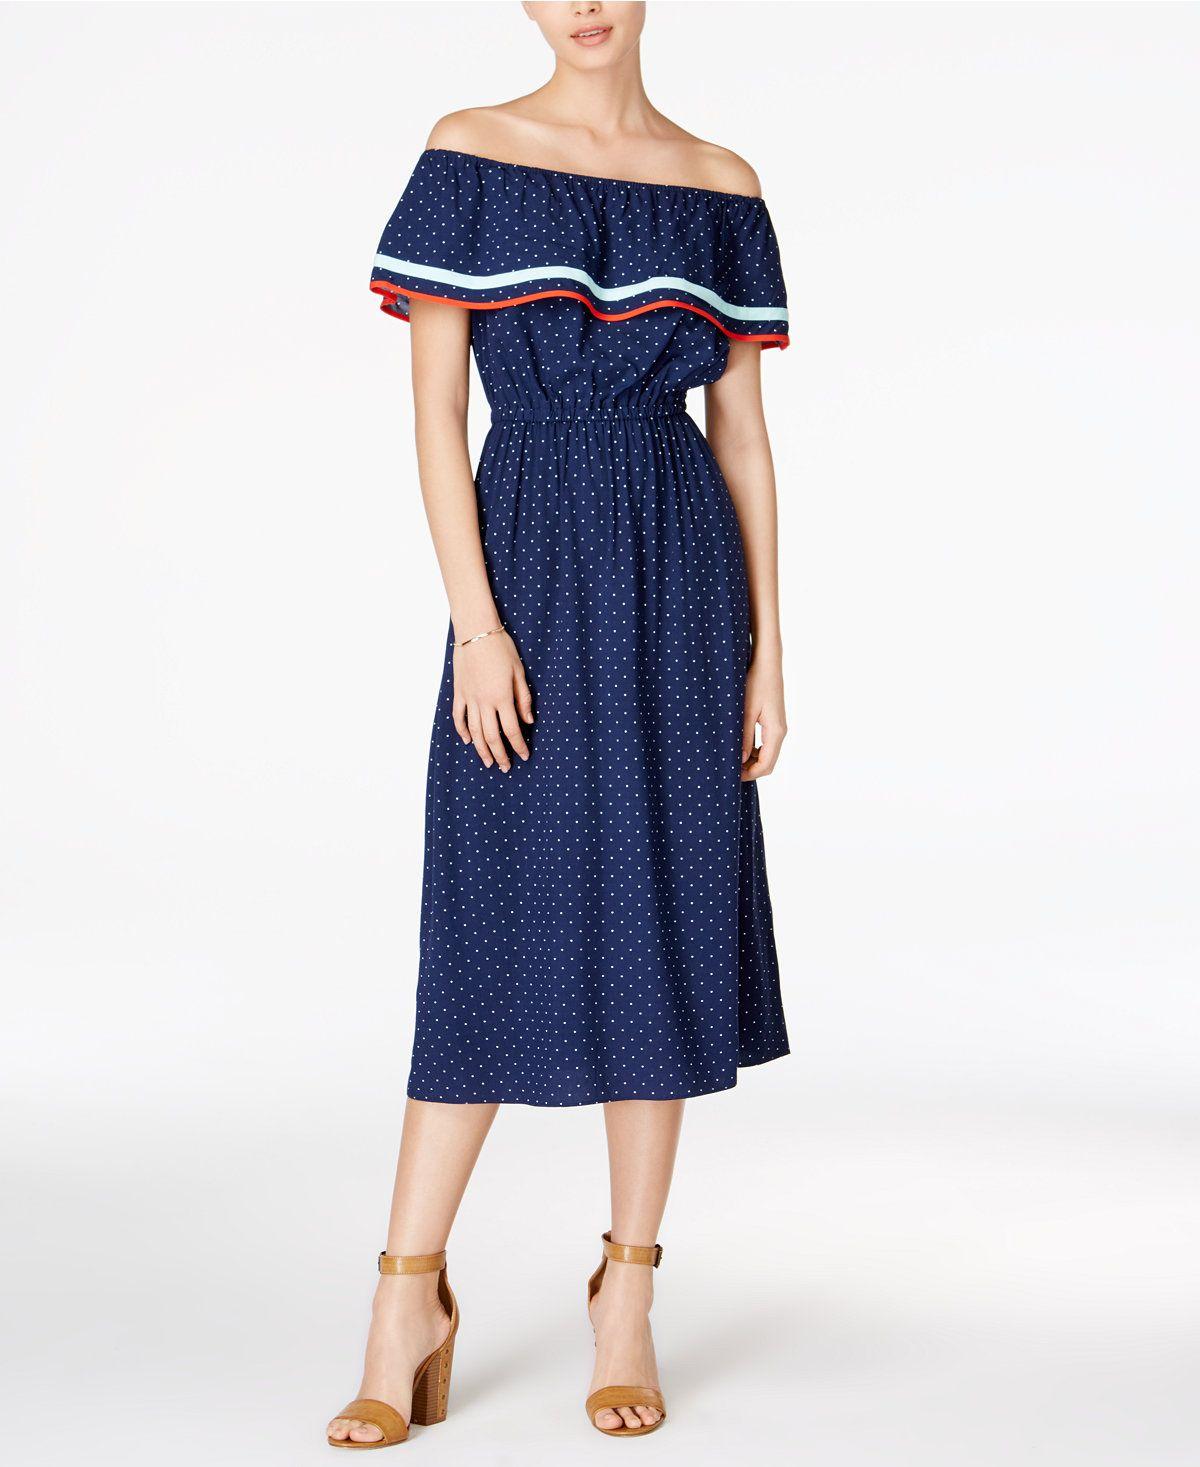 db1085d6103 Maison Jules Fiesta Cotton Off-The-Shoulder Flounce Dress